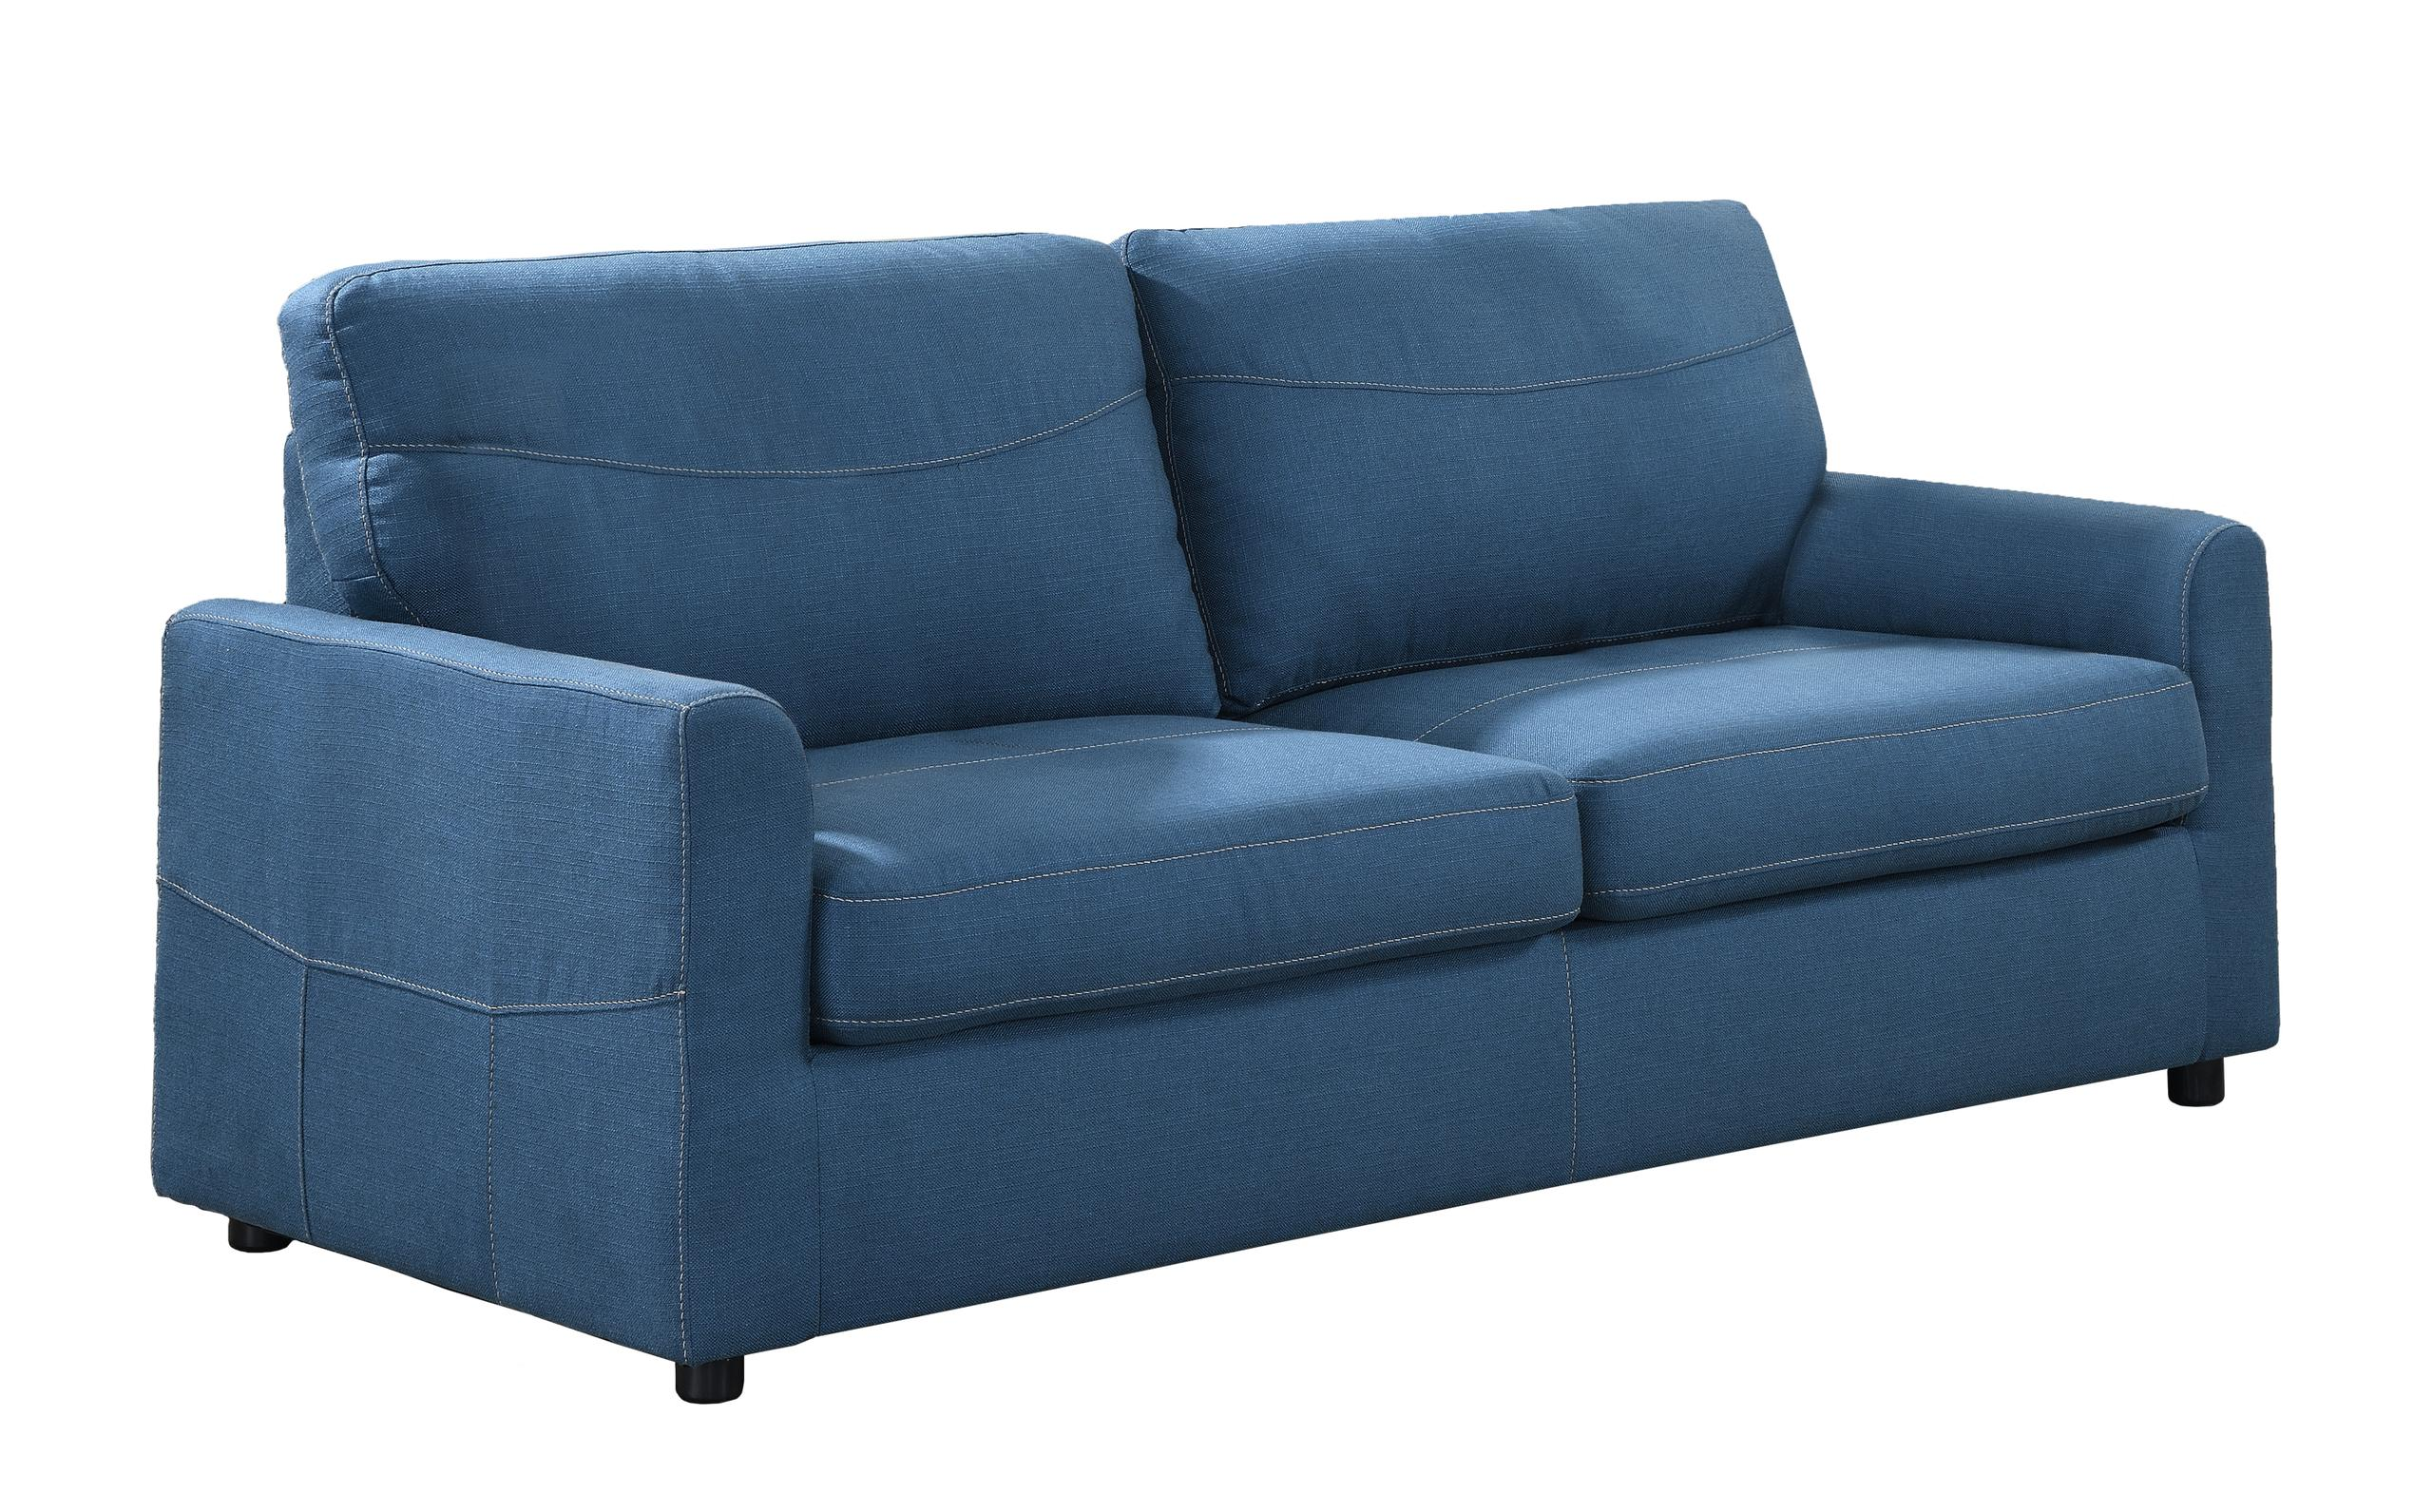 Emerald Home FurnishingsSlumber Queen Sleeper Sofa, Blue U3215-50-24